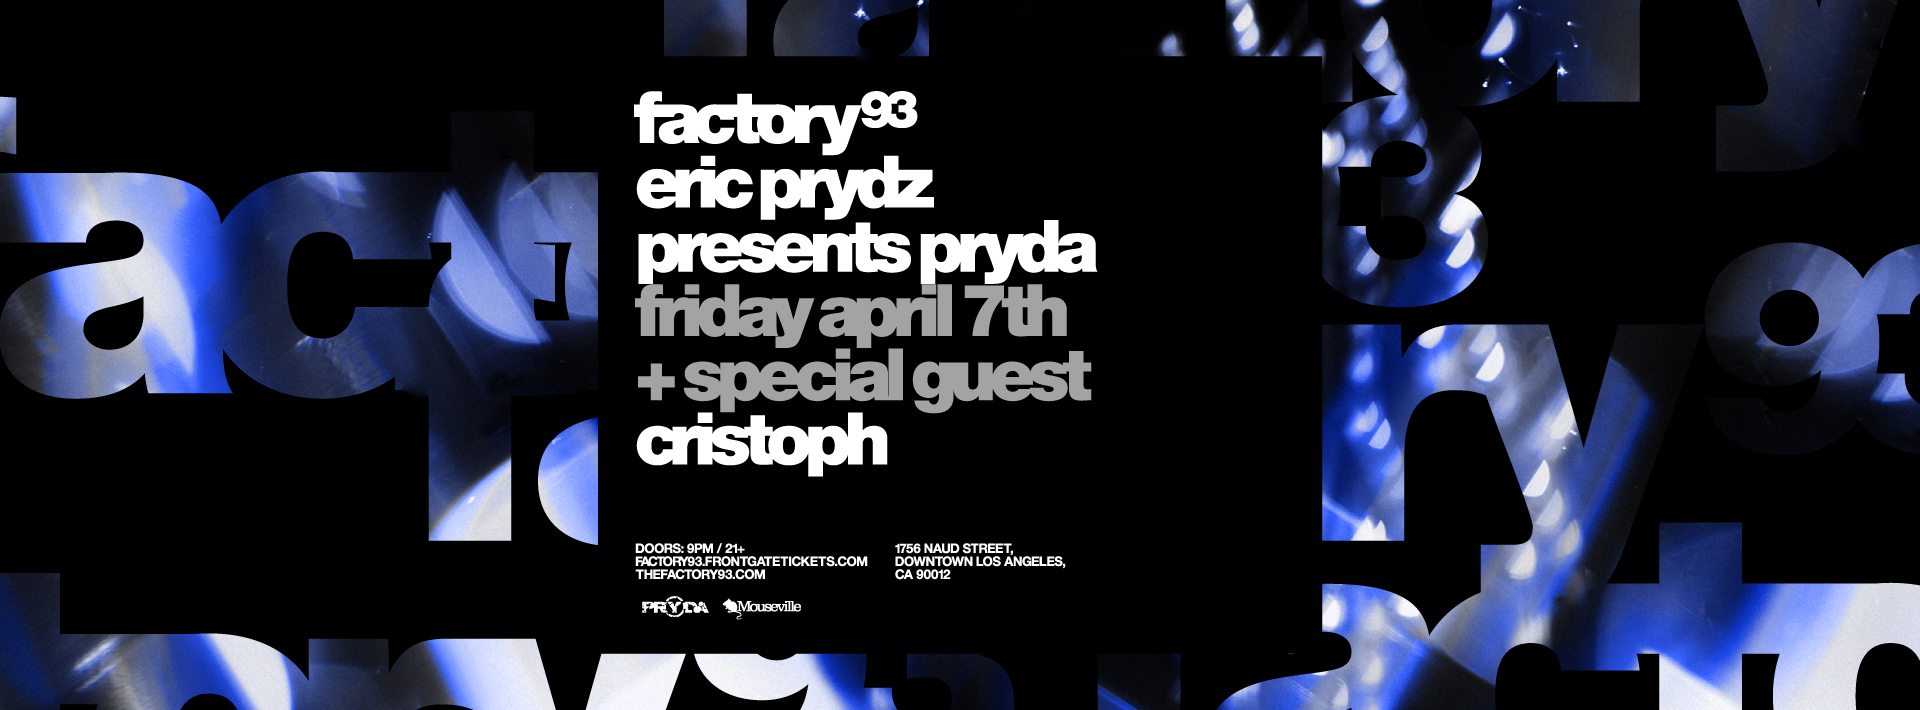 Eric Prydz presents Pryda <br />(Night 1)